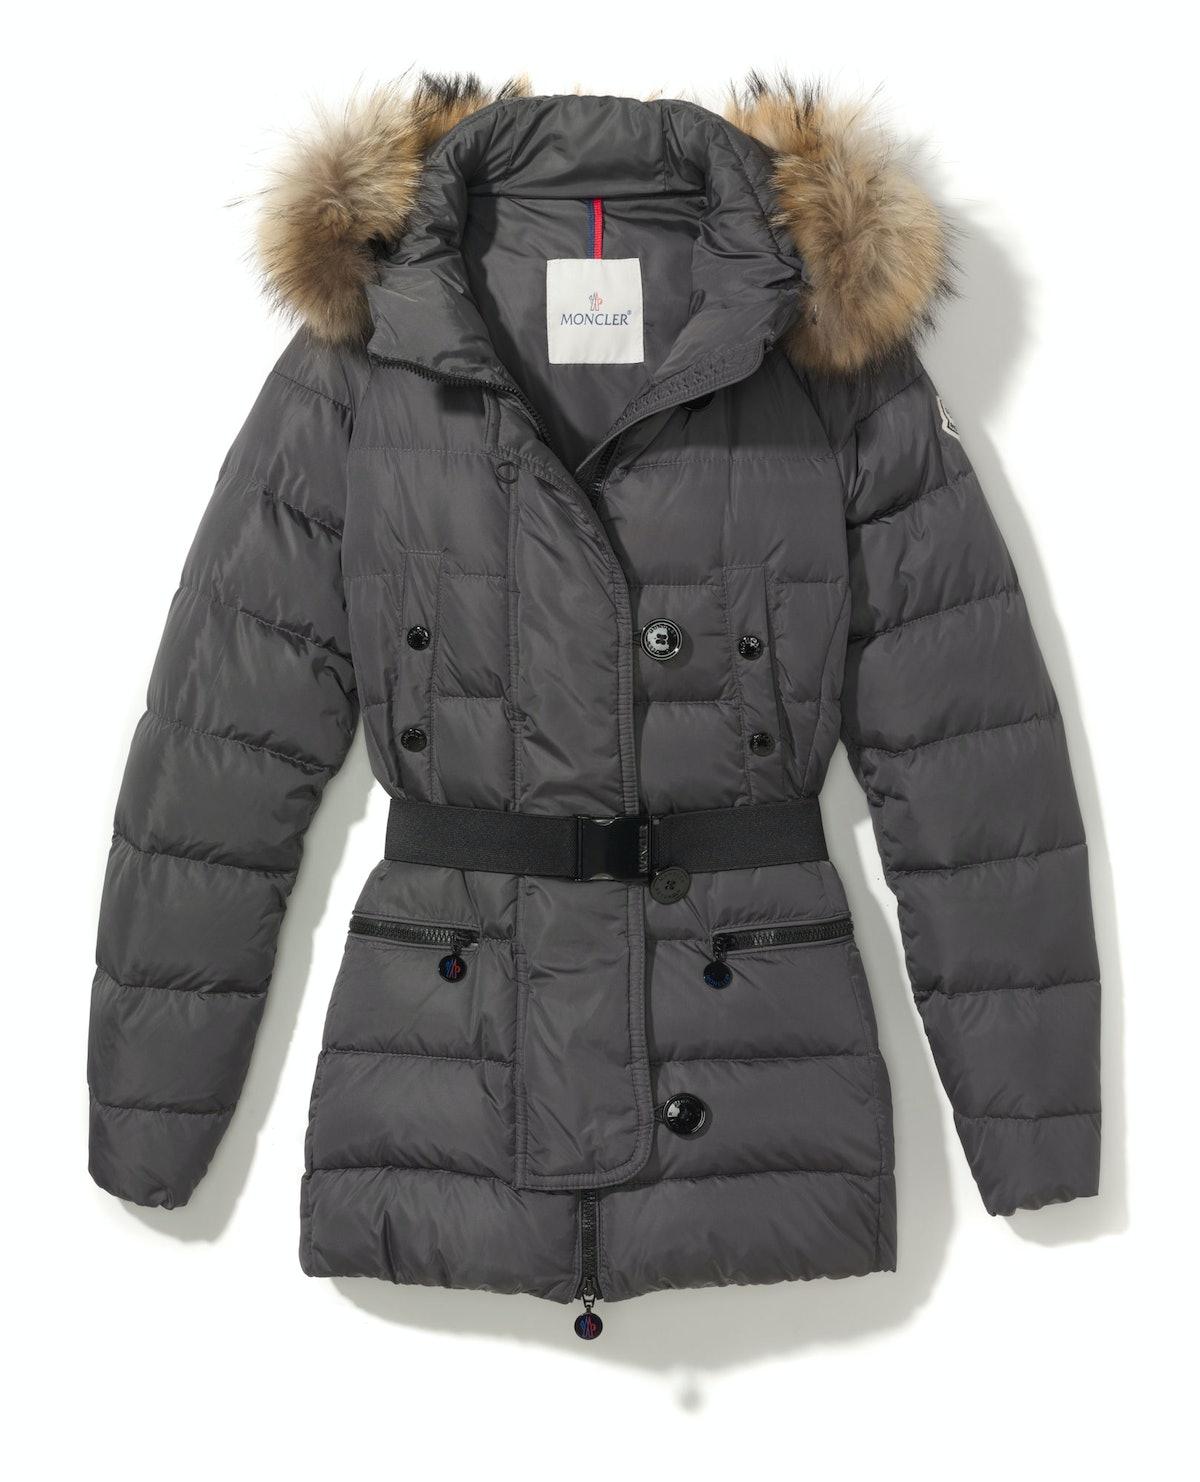 Moncler jacket, $1,450, [barneys.com](http://rstyle.me/n/drf9u3w3n).